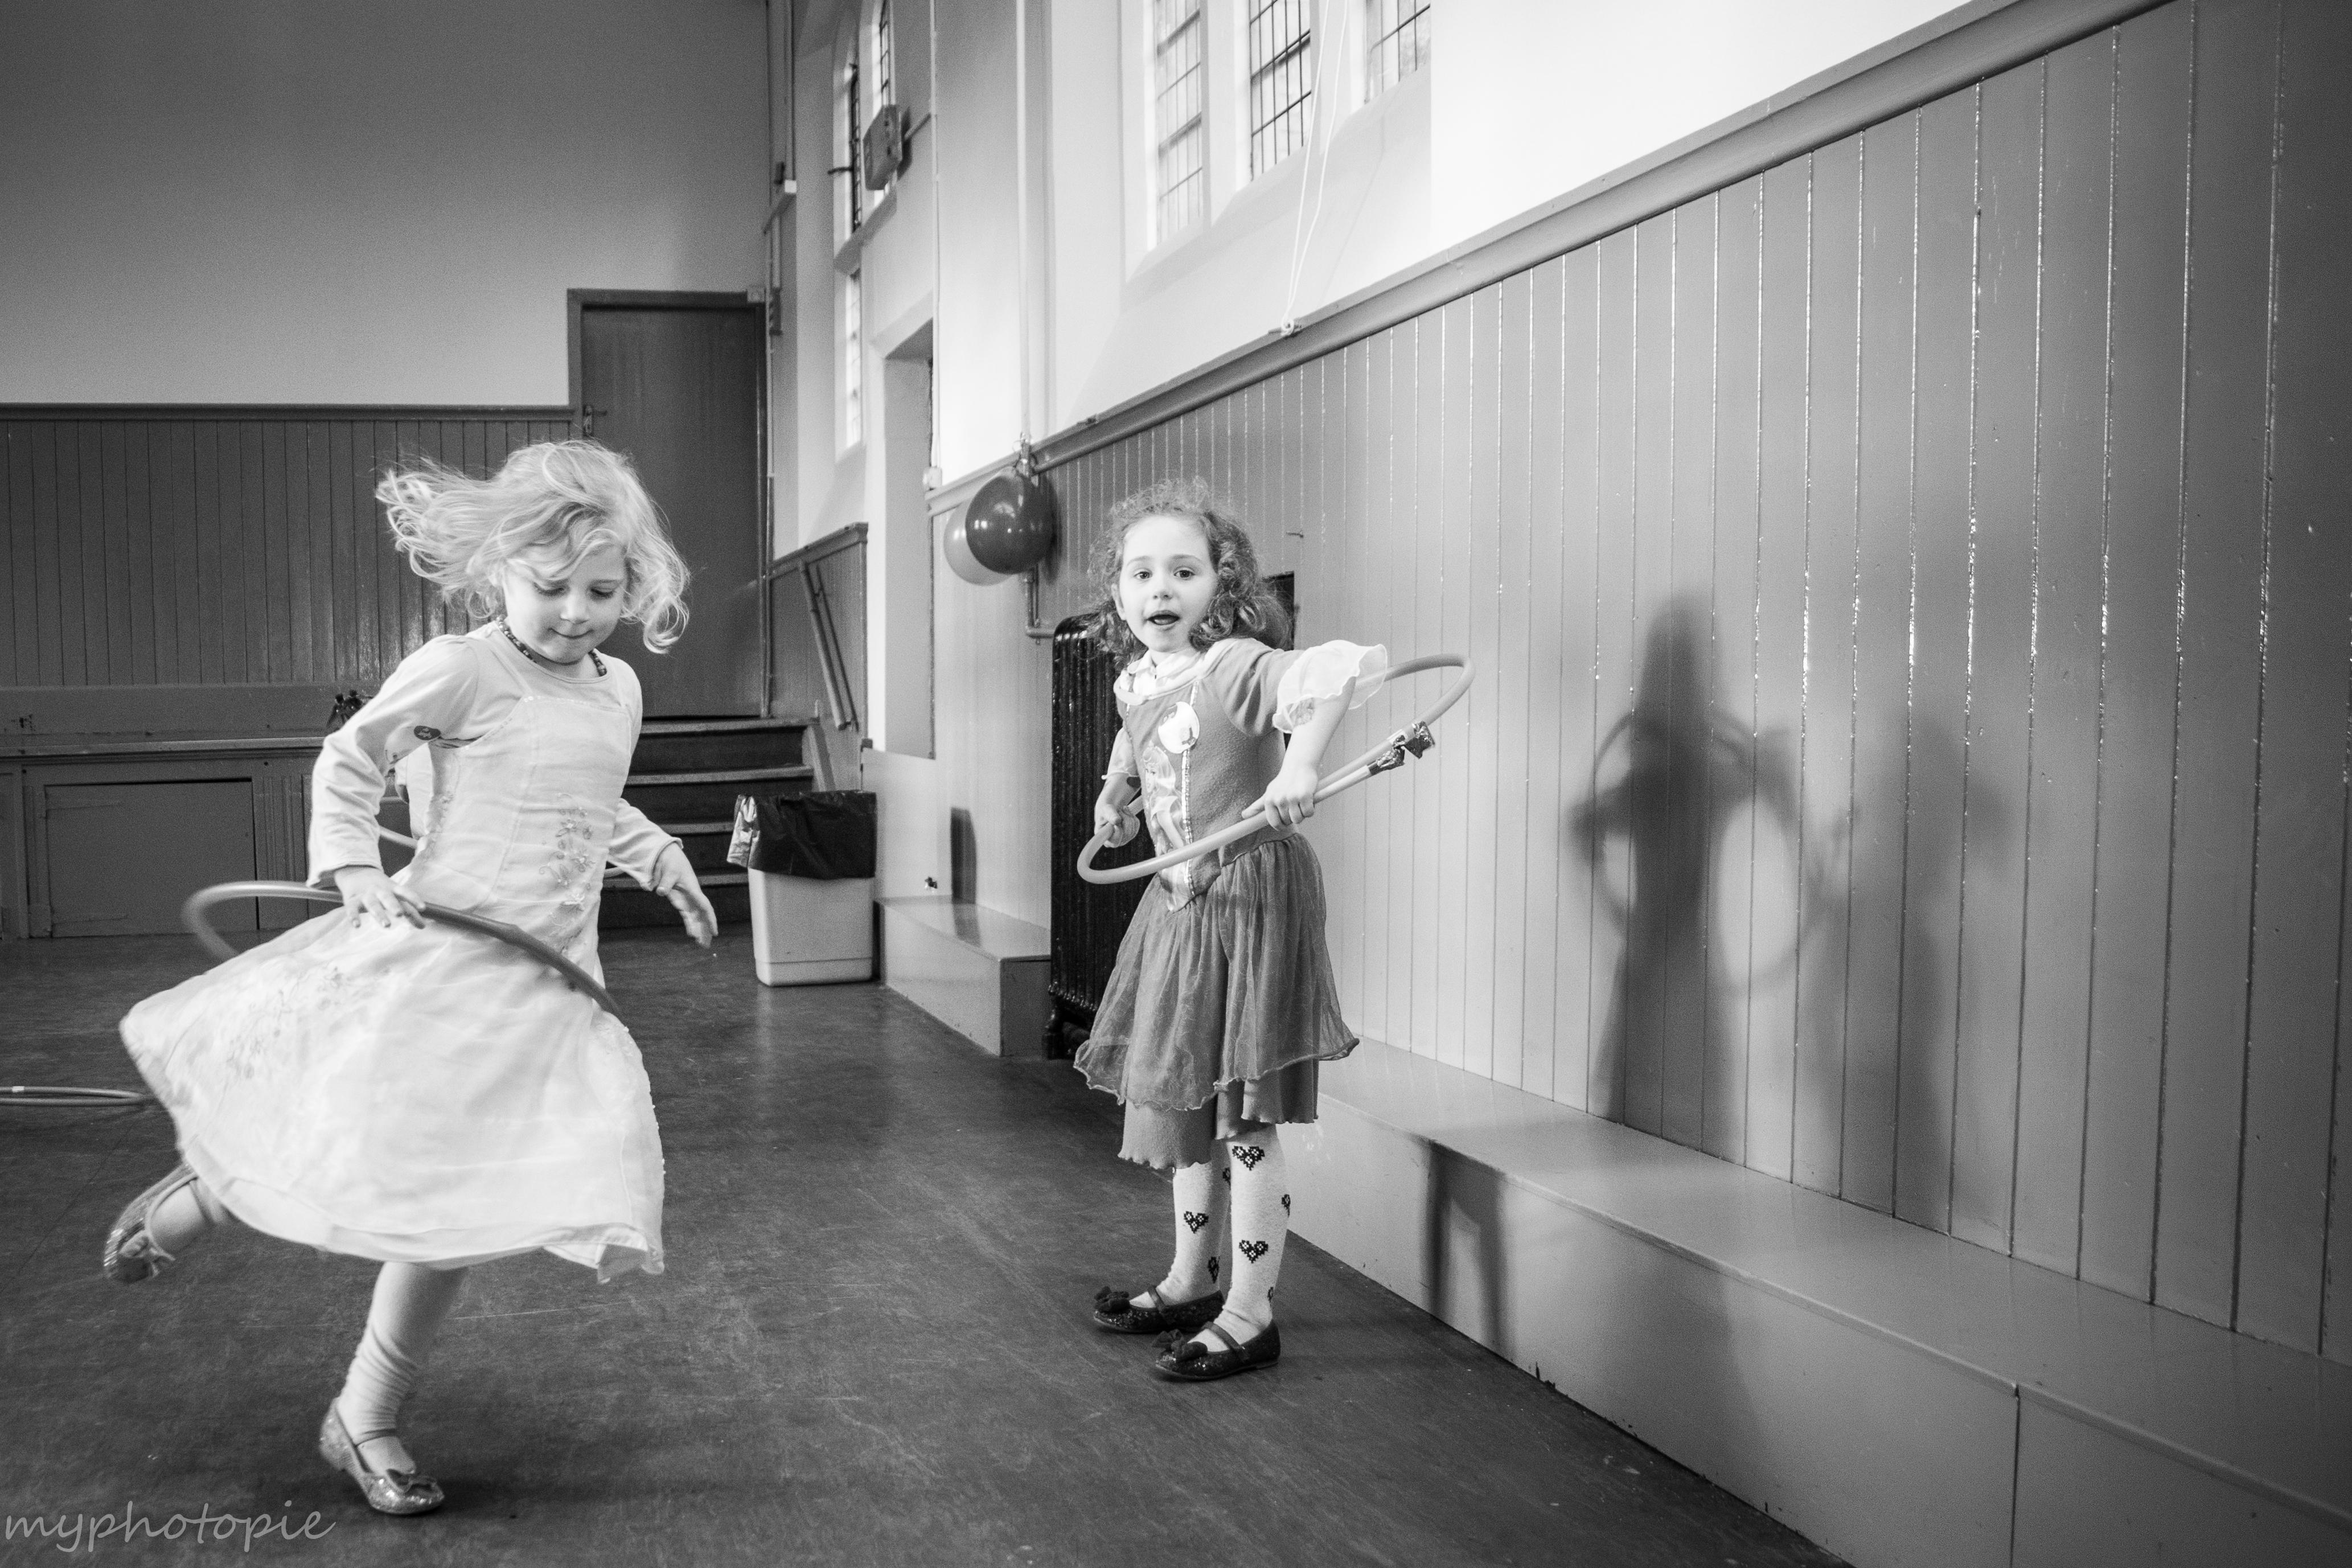 childhood fun copyrights myphotopie